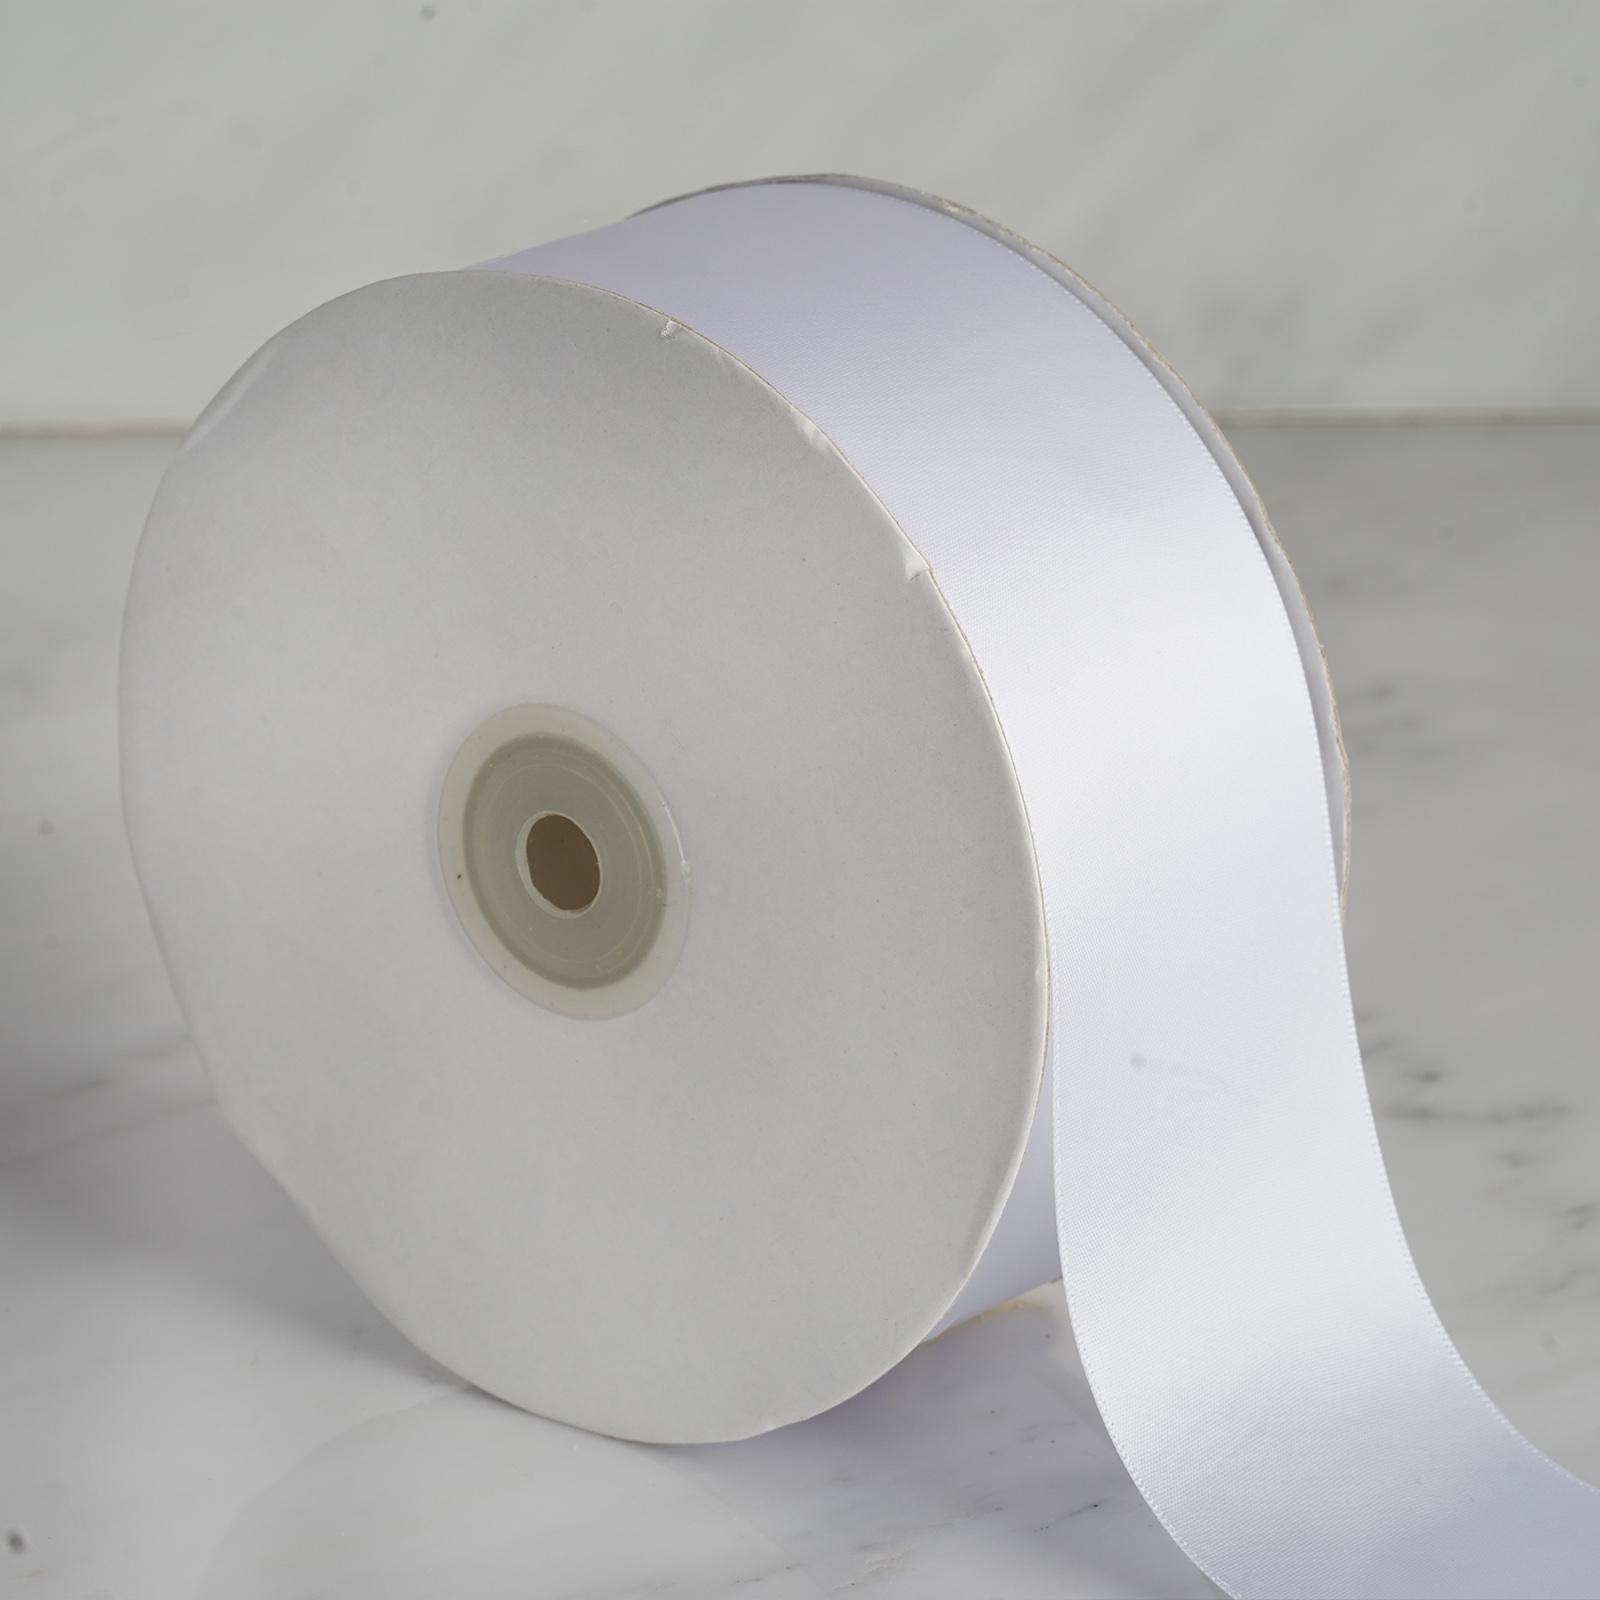 2-034-x-50-yards-Single-Side-Satin-Ribbon-Wedding-Favors-Sewing-Crafts-Decorations thumbnail 19